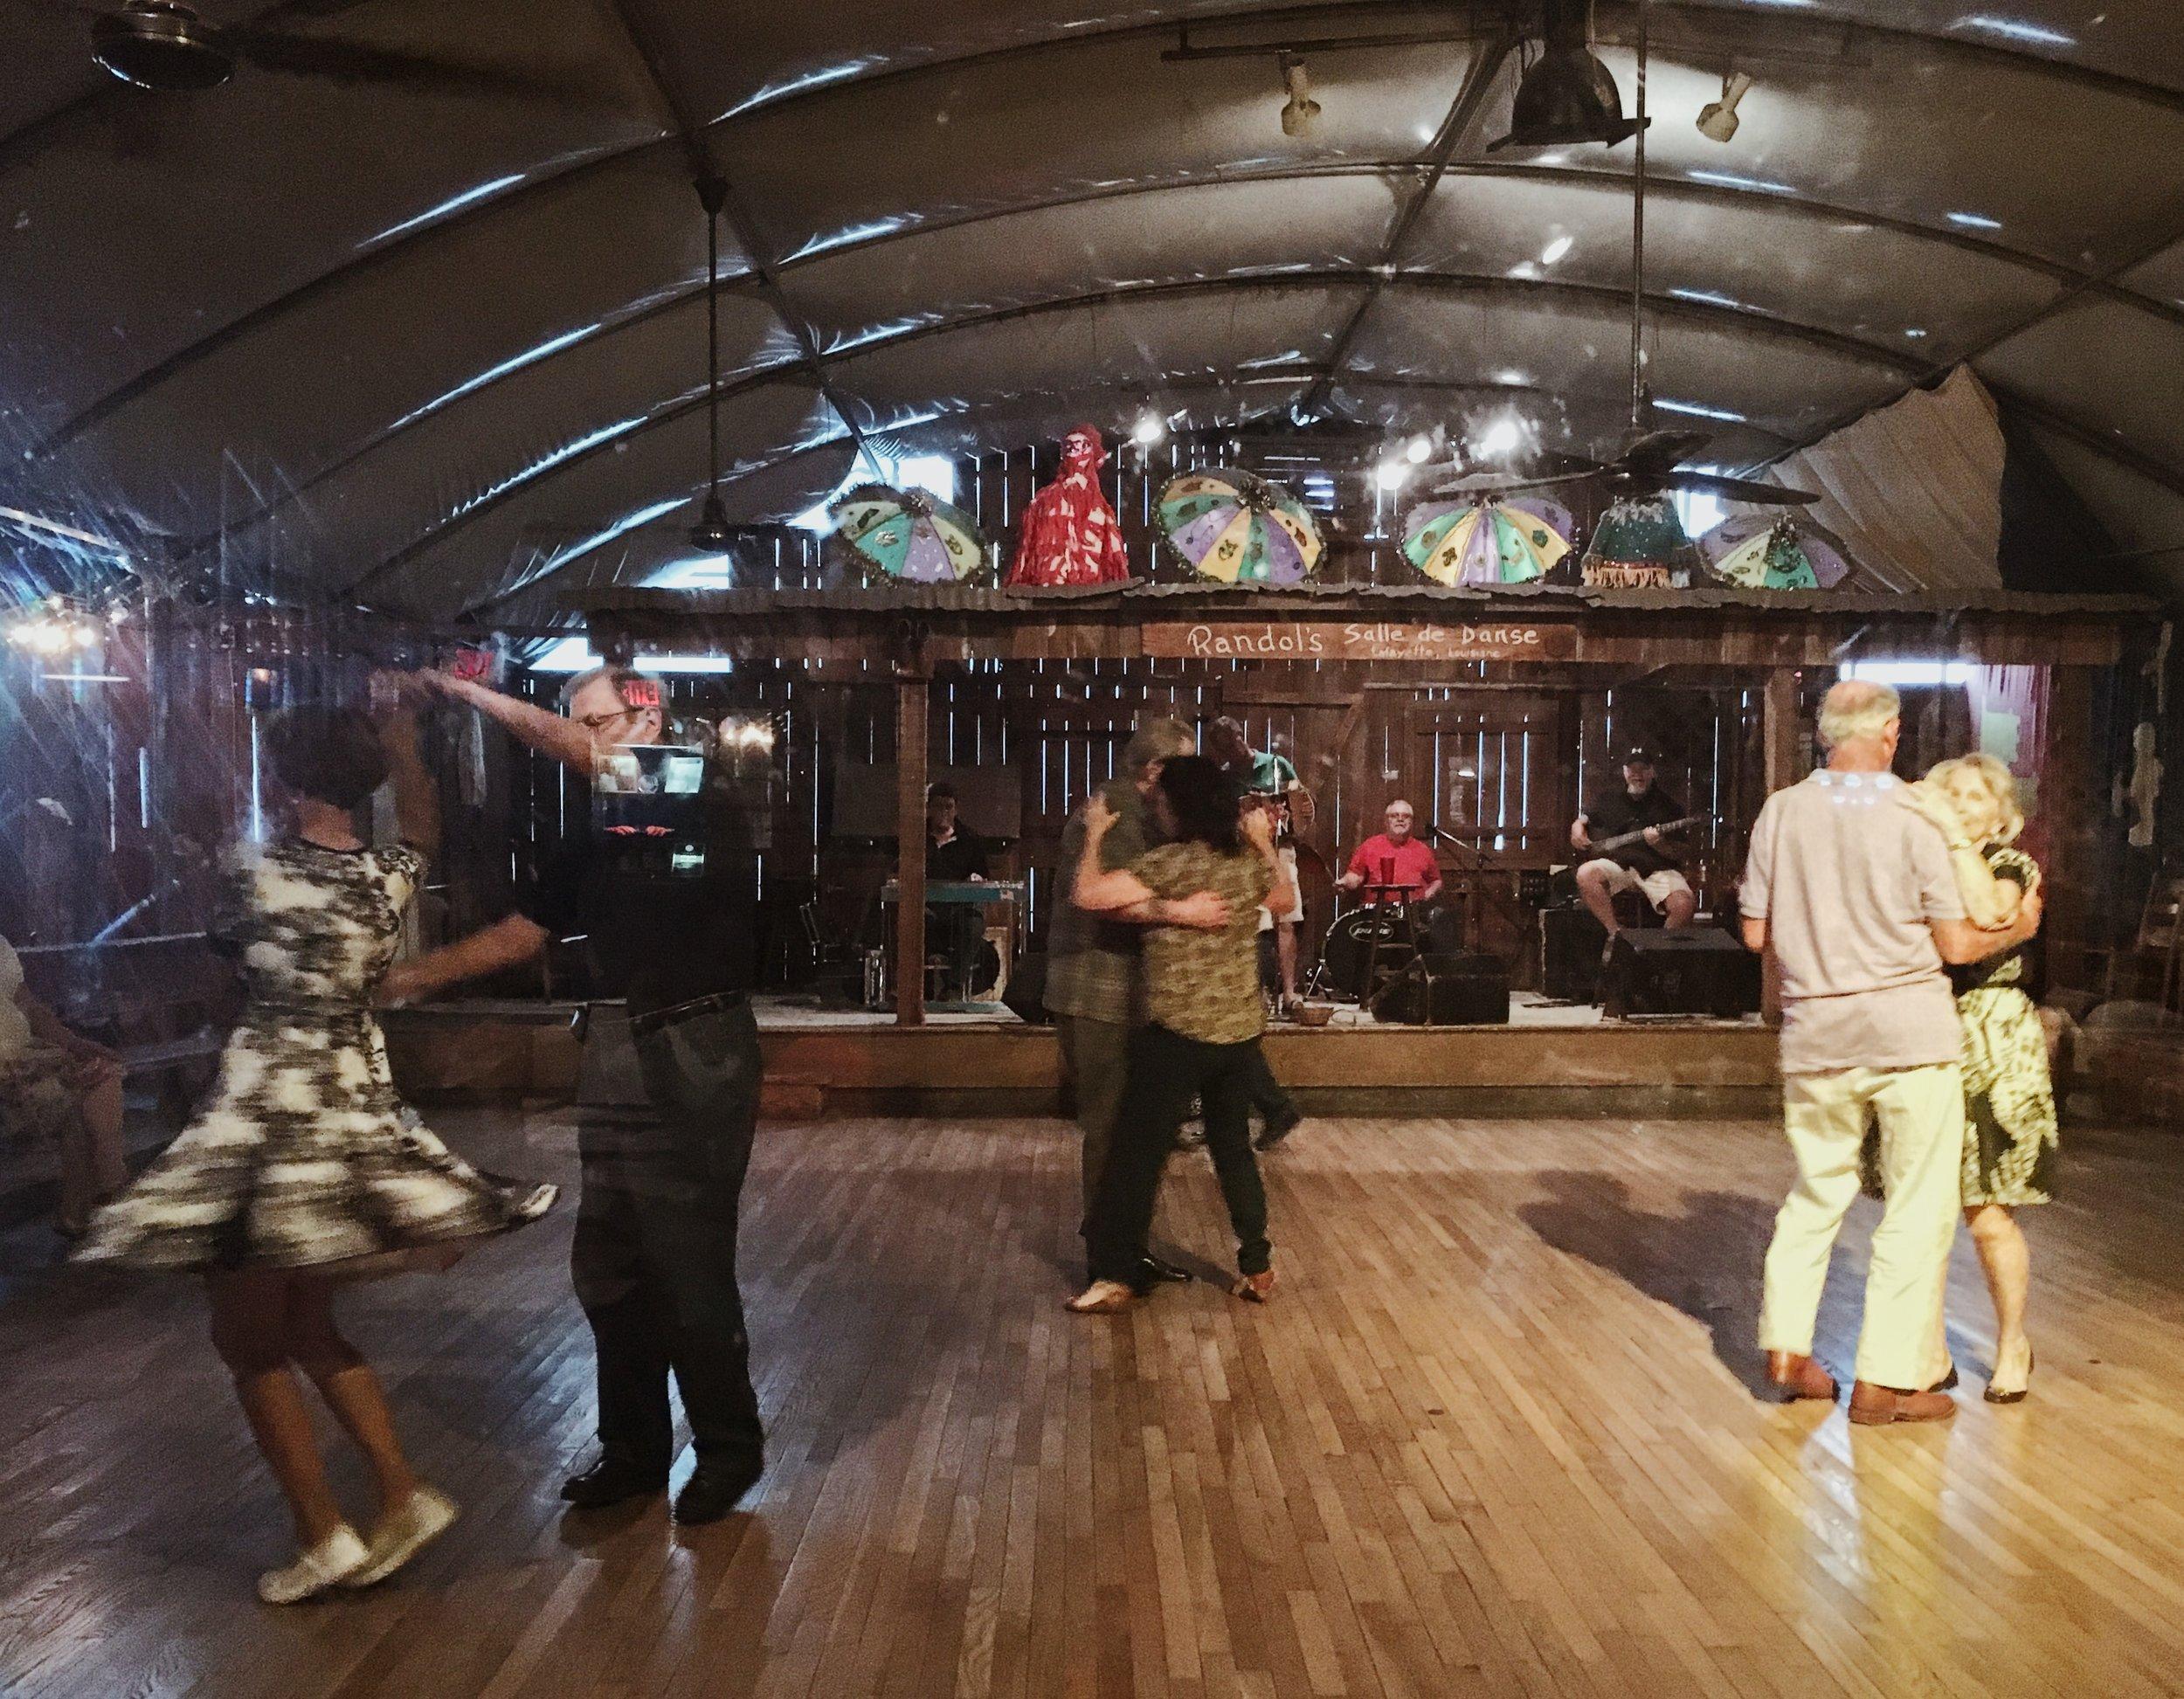 5.31.18 // Dancing at Randol's with a live band